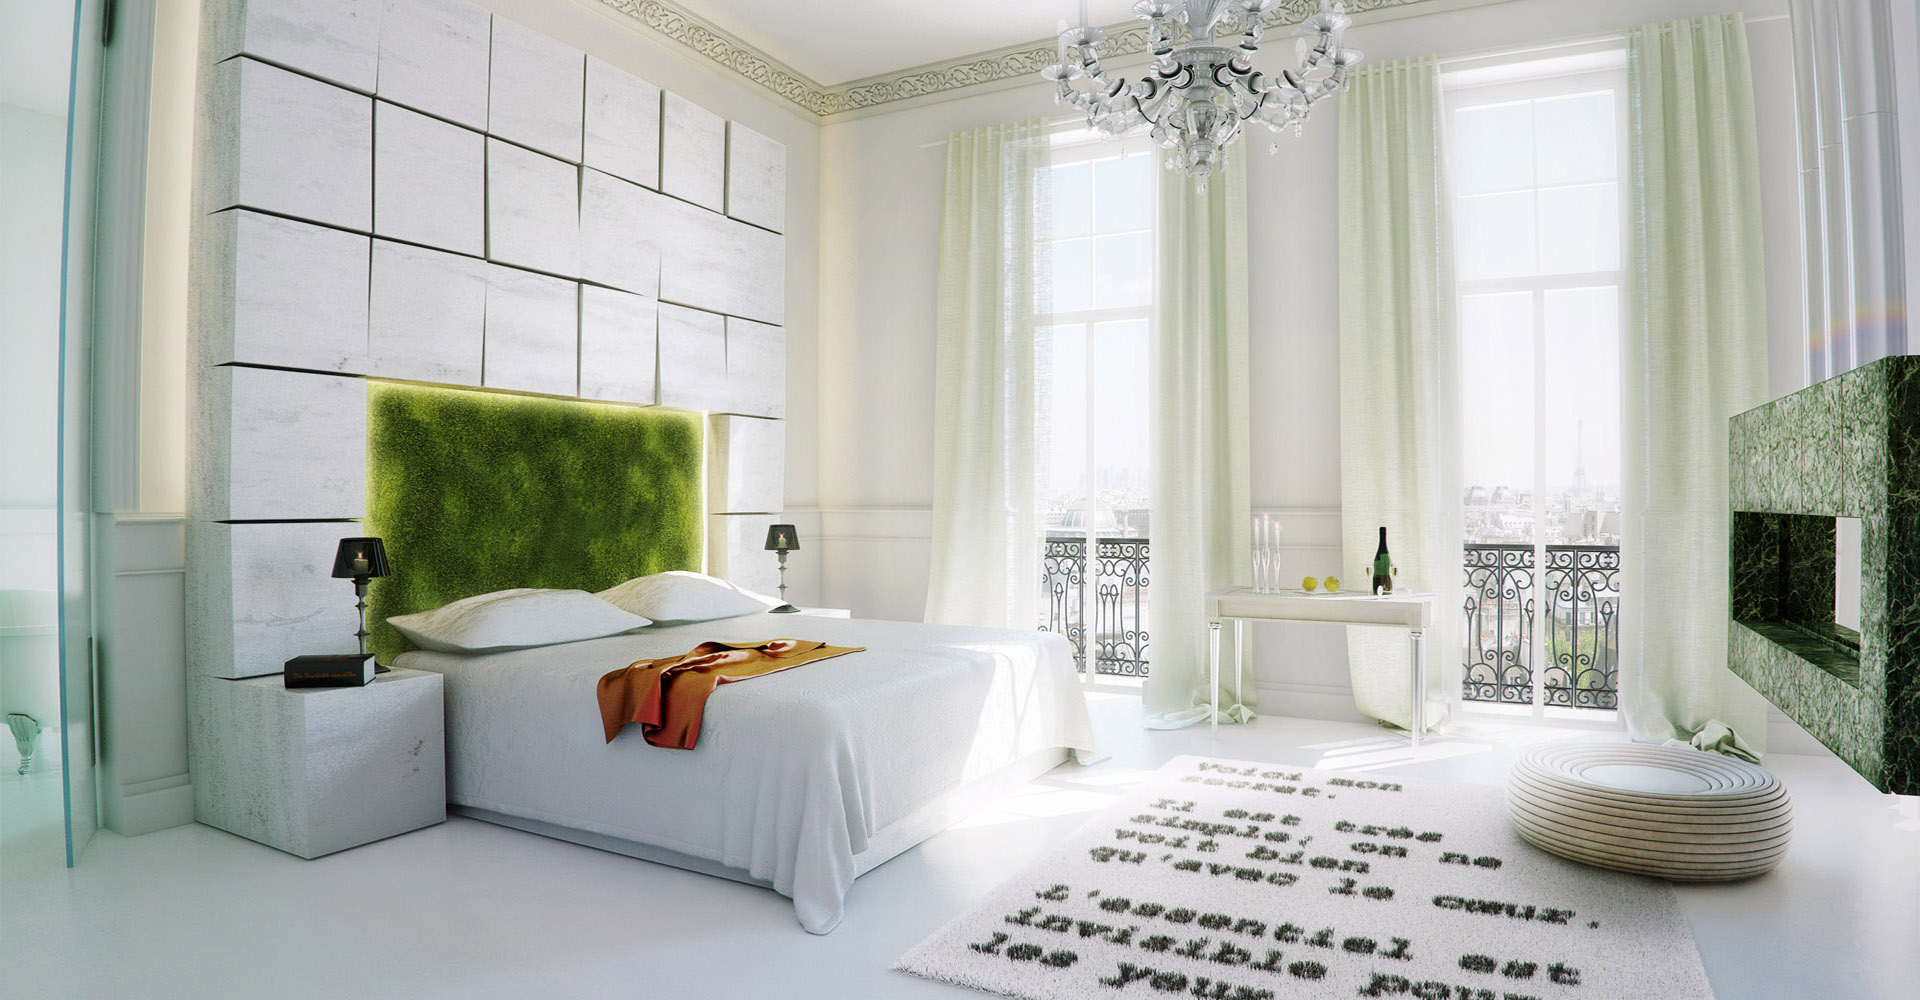 Hotel Suite Interior - Final